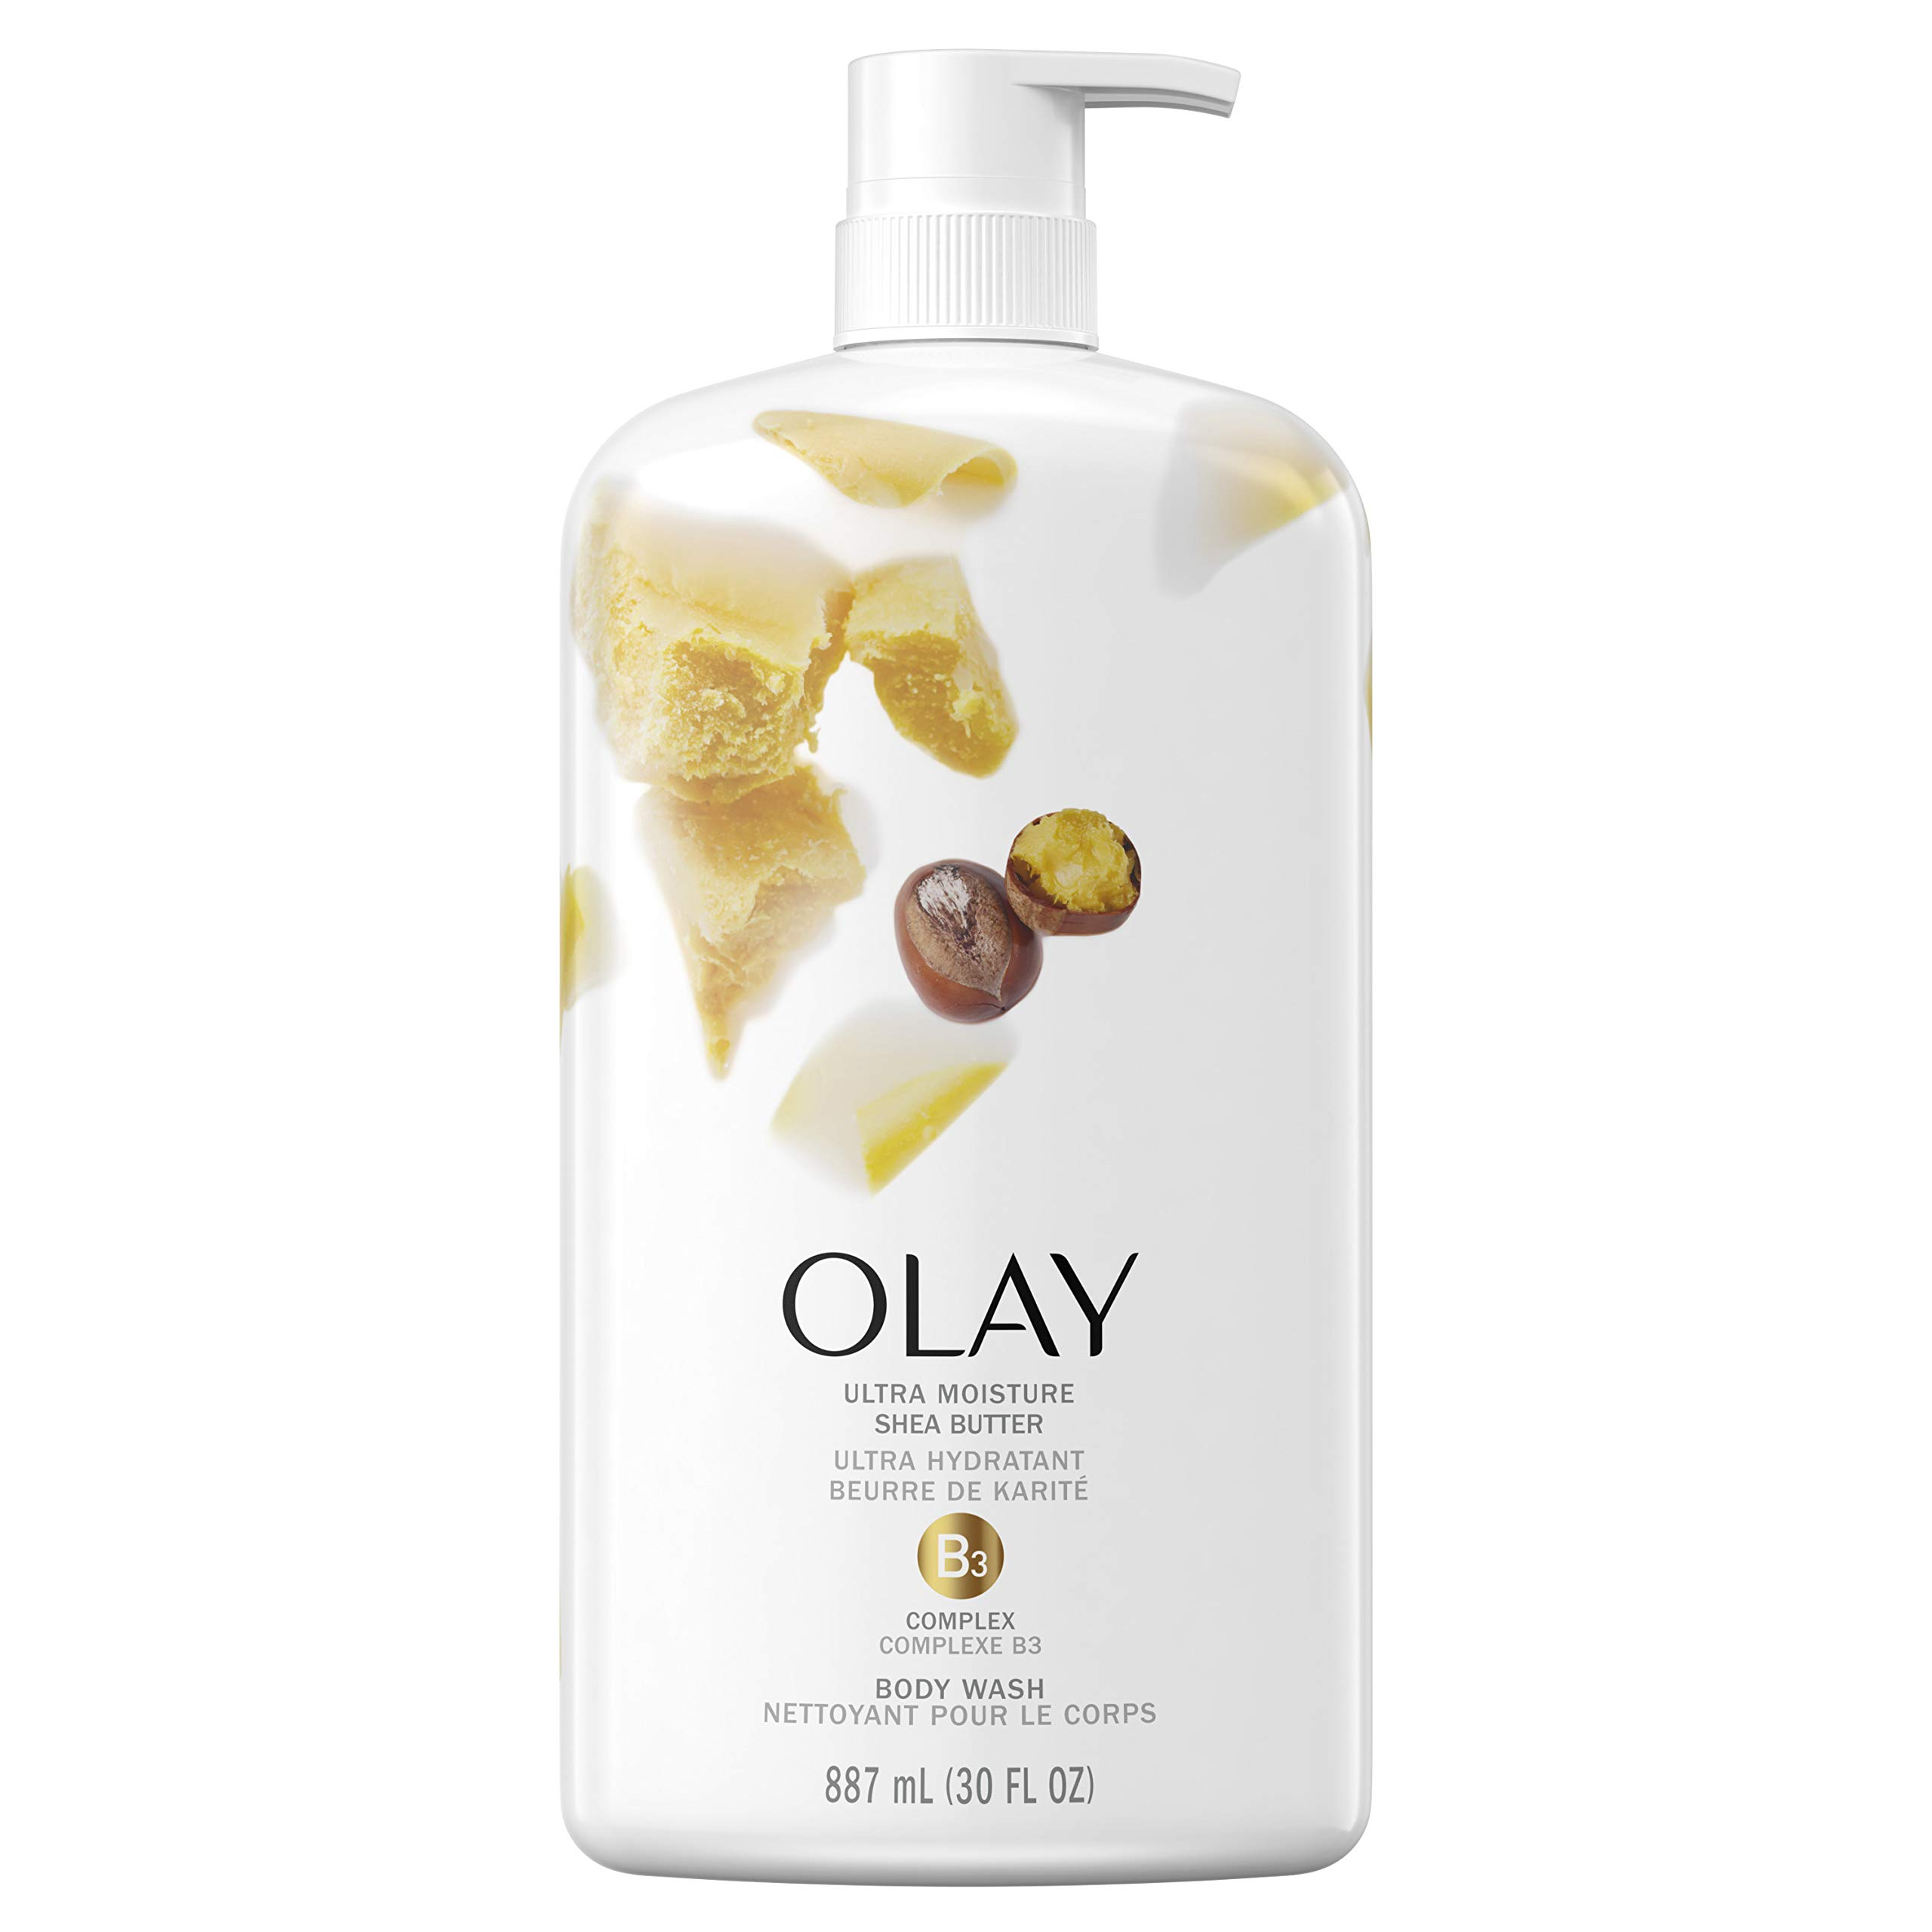 Olay Ultra Moisture Body Wash with Shea Butter, 30 fl oz